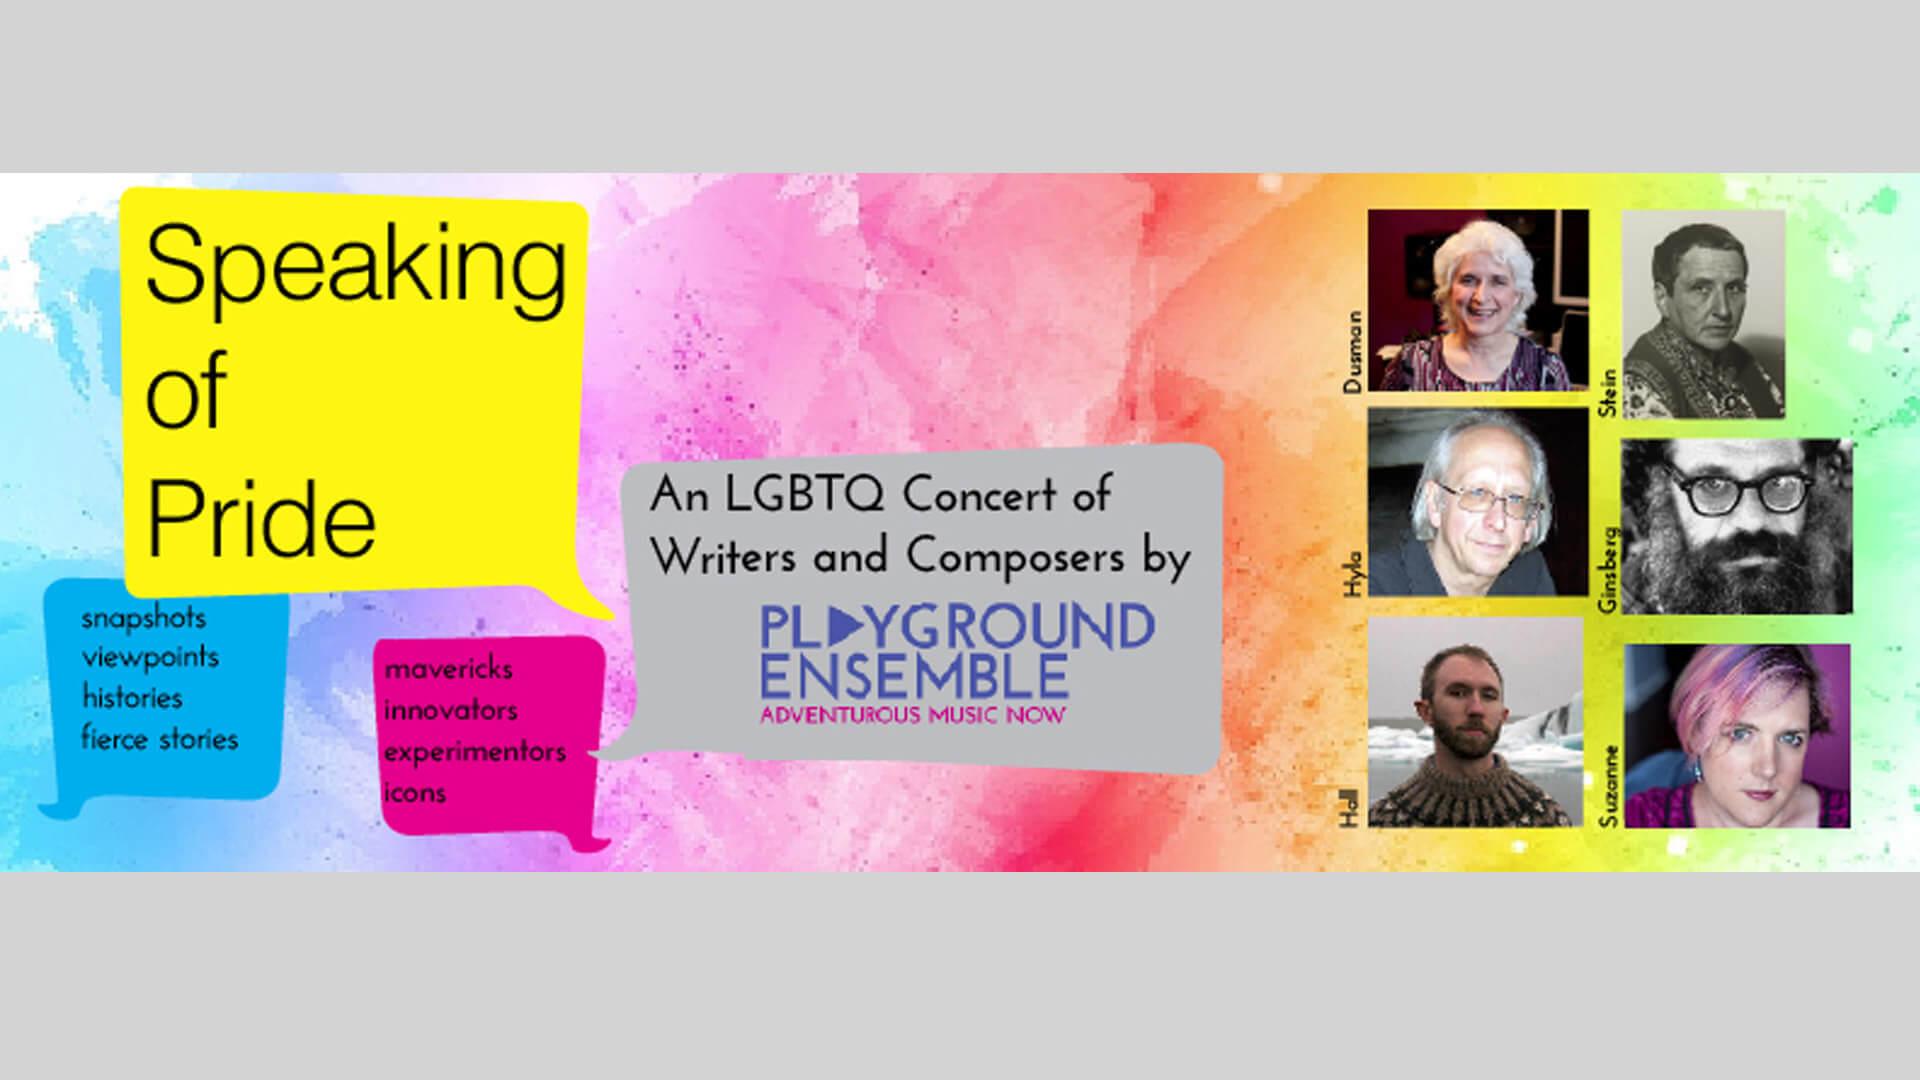 Speaking of Pride Concert